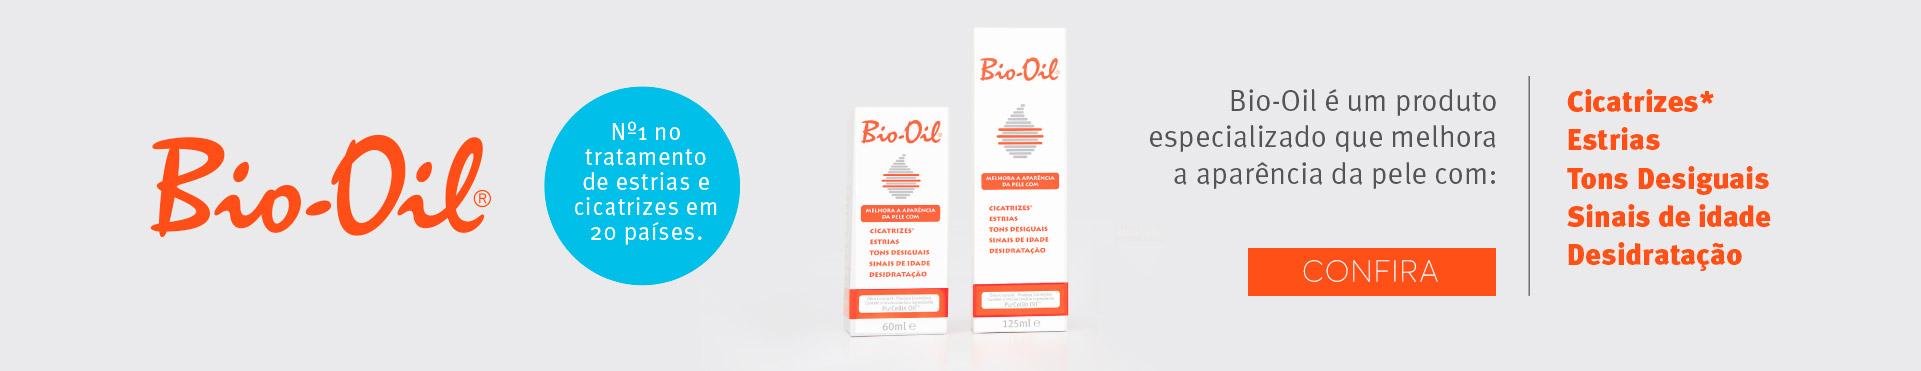 DEZEMBRO BioOil